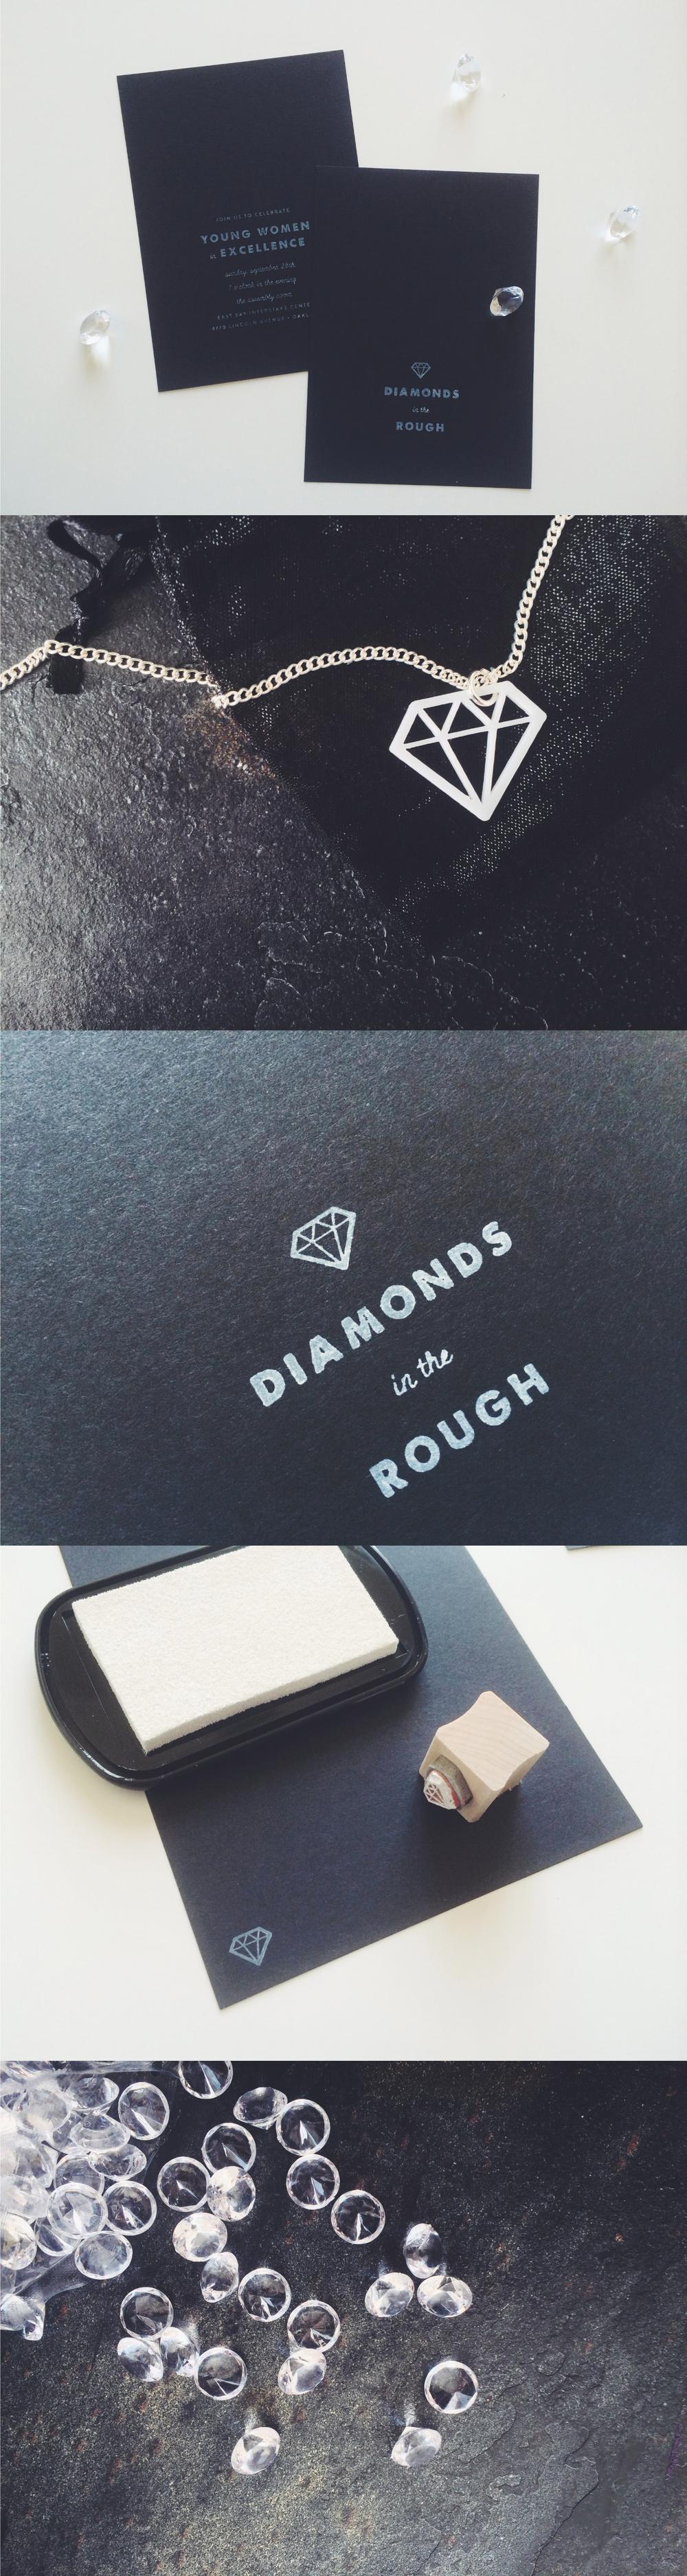 brittanyalise_diamonds_rough.jpg